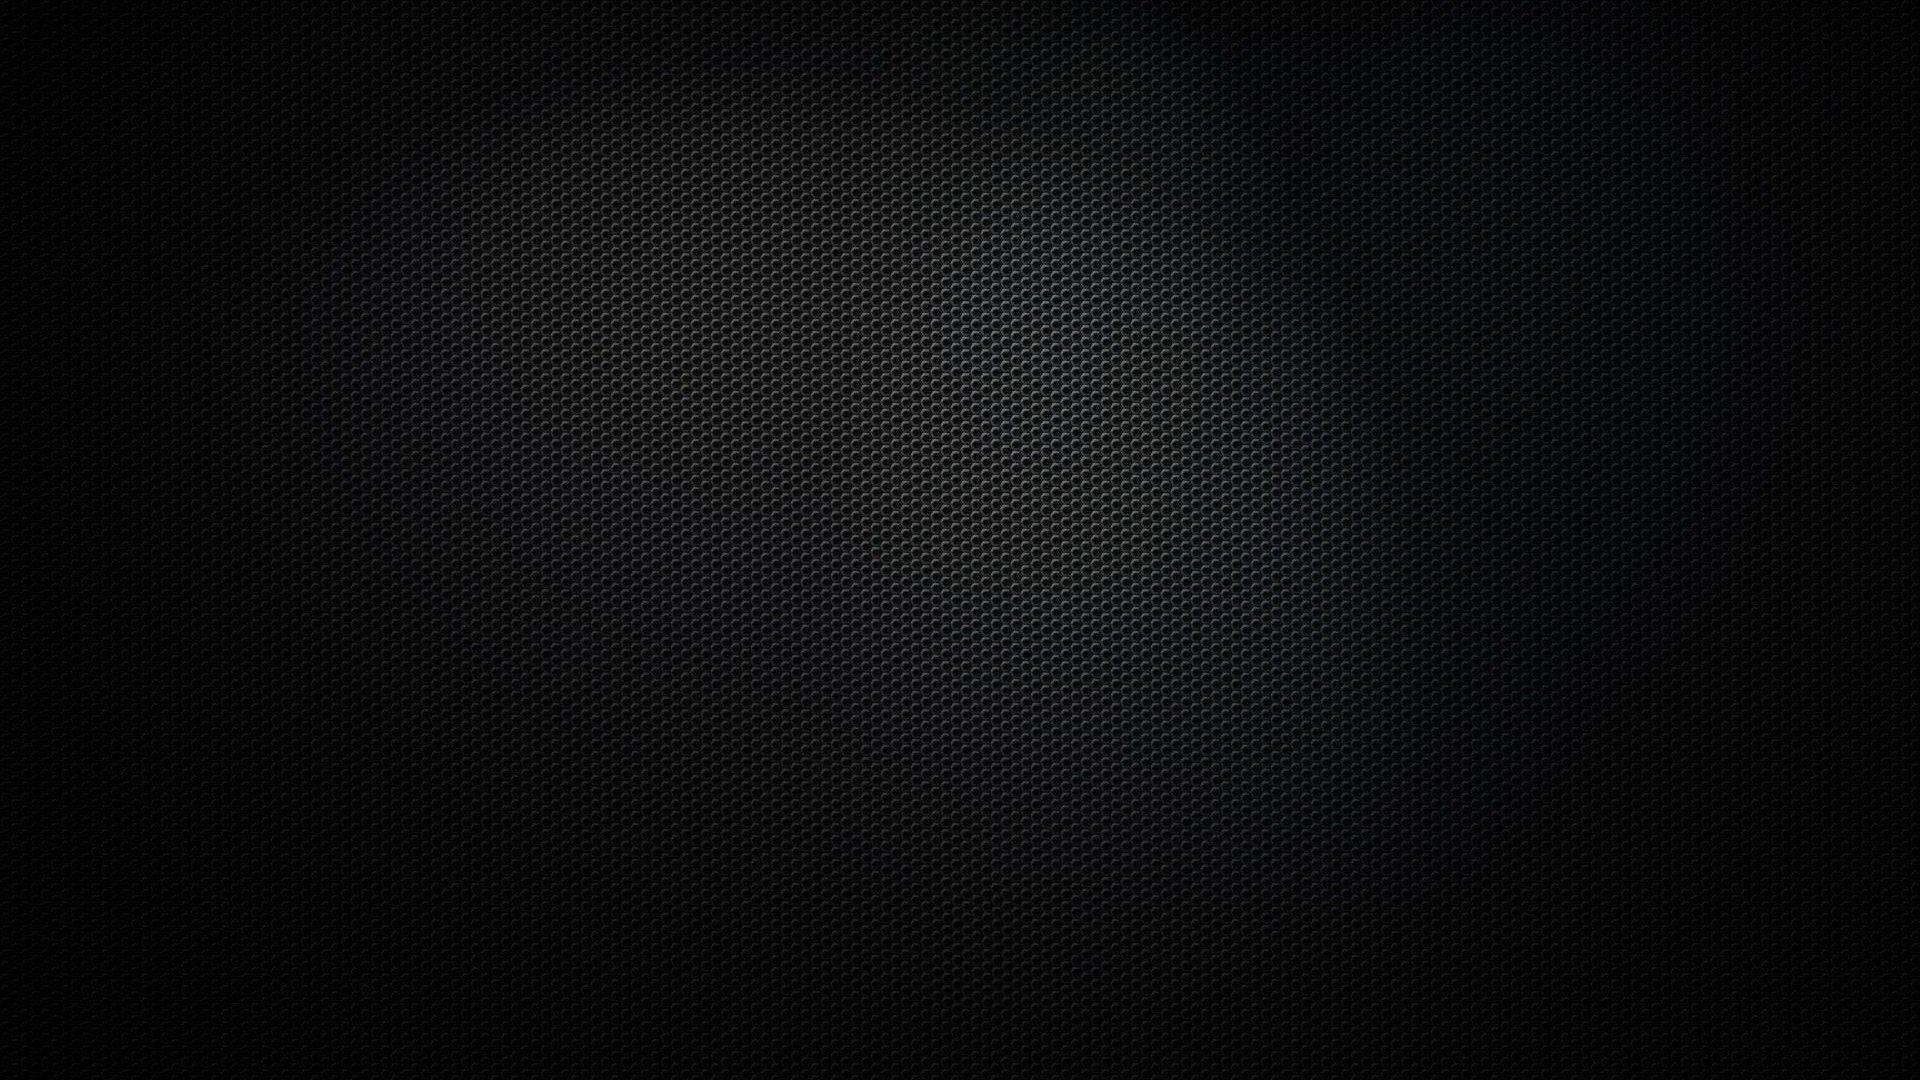 Black Hd Desktop Wallpapers Top Free Black Hd Desktop